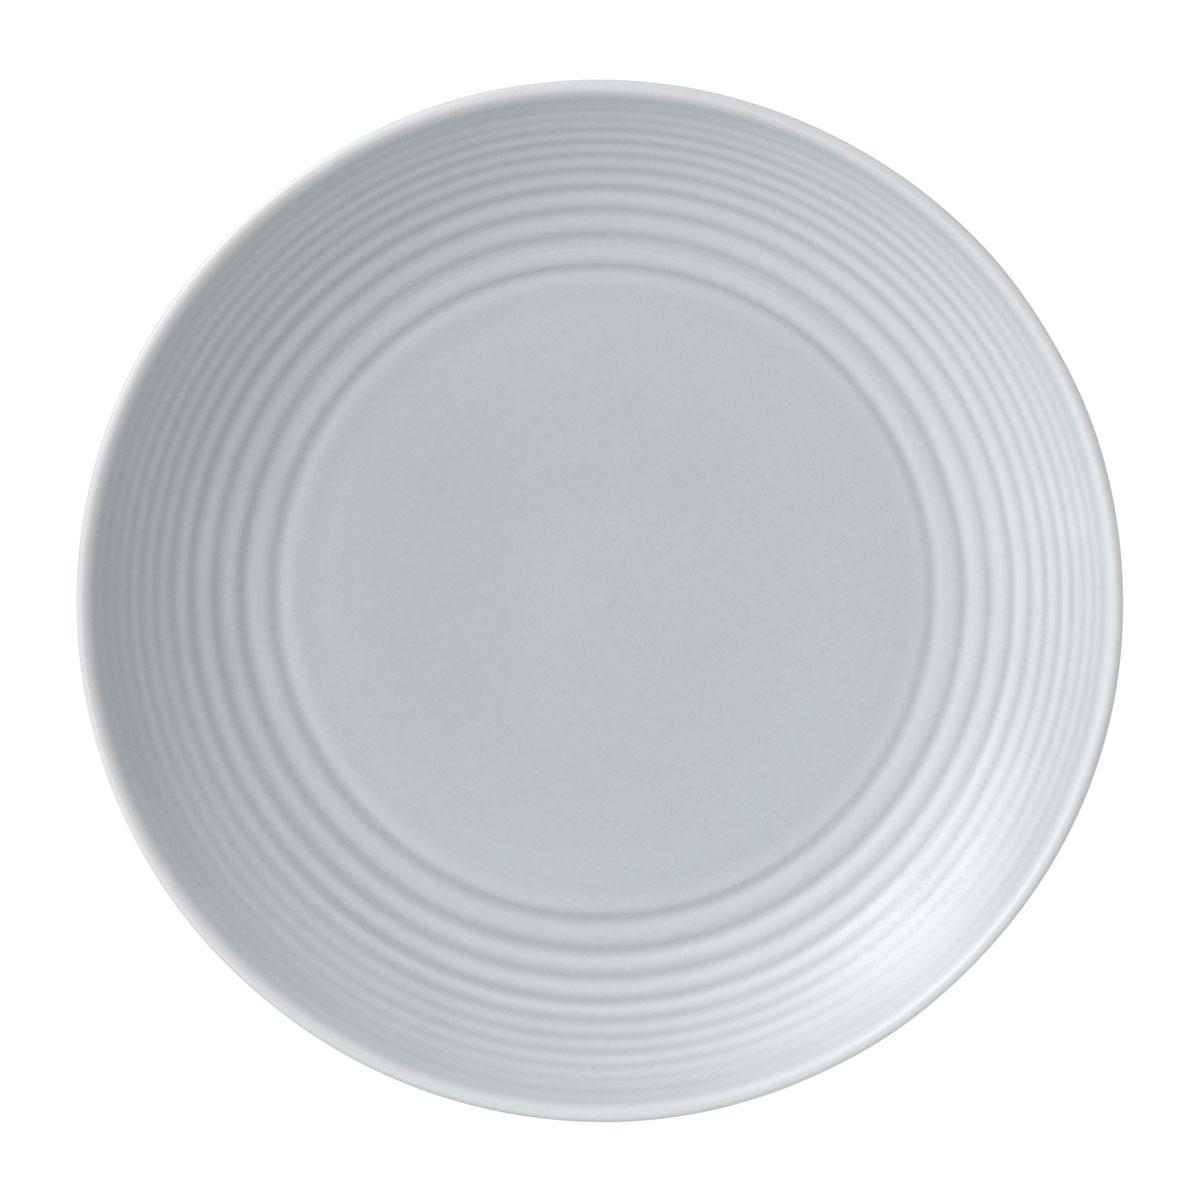 Royal Doulton Gordon Ramsay Maze Light Grey Salad Plate